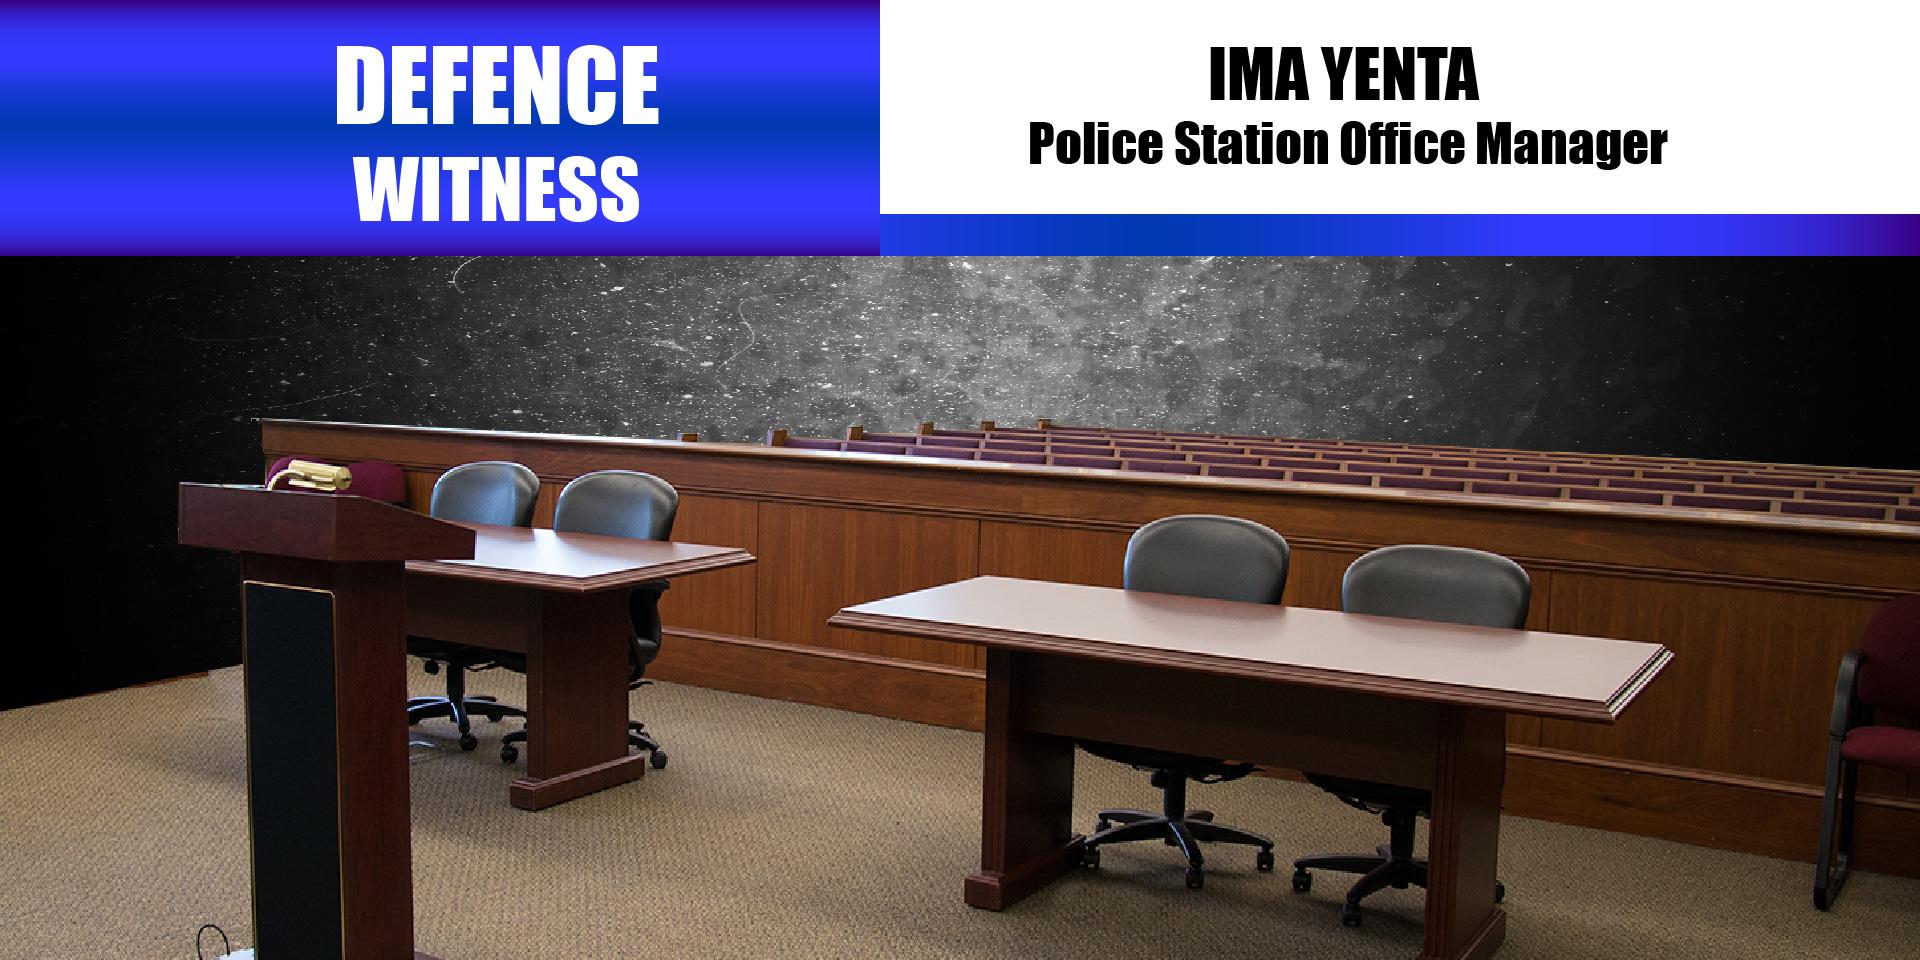 Defence Witness – Ima Yenta